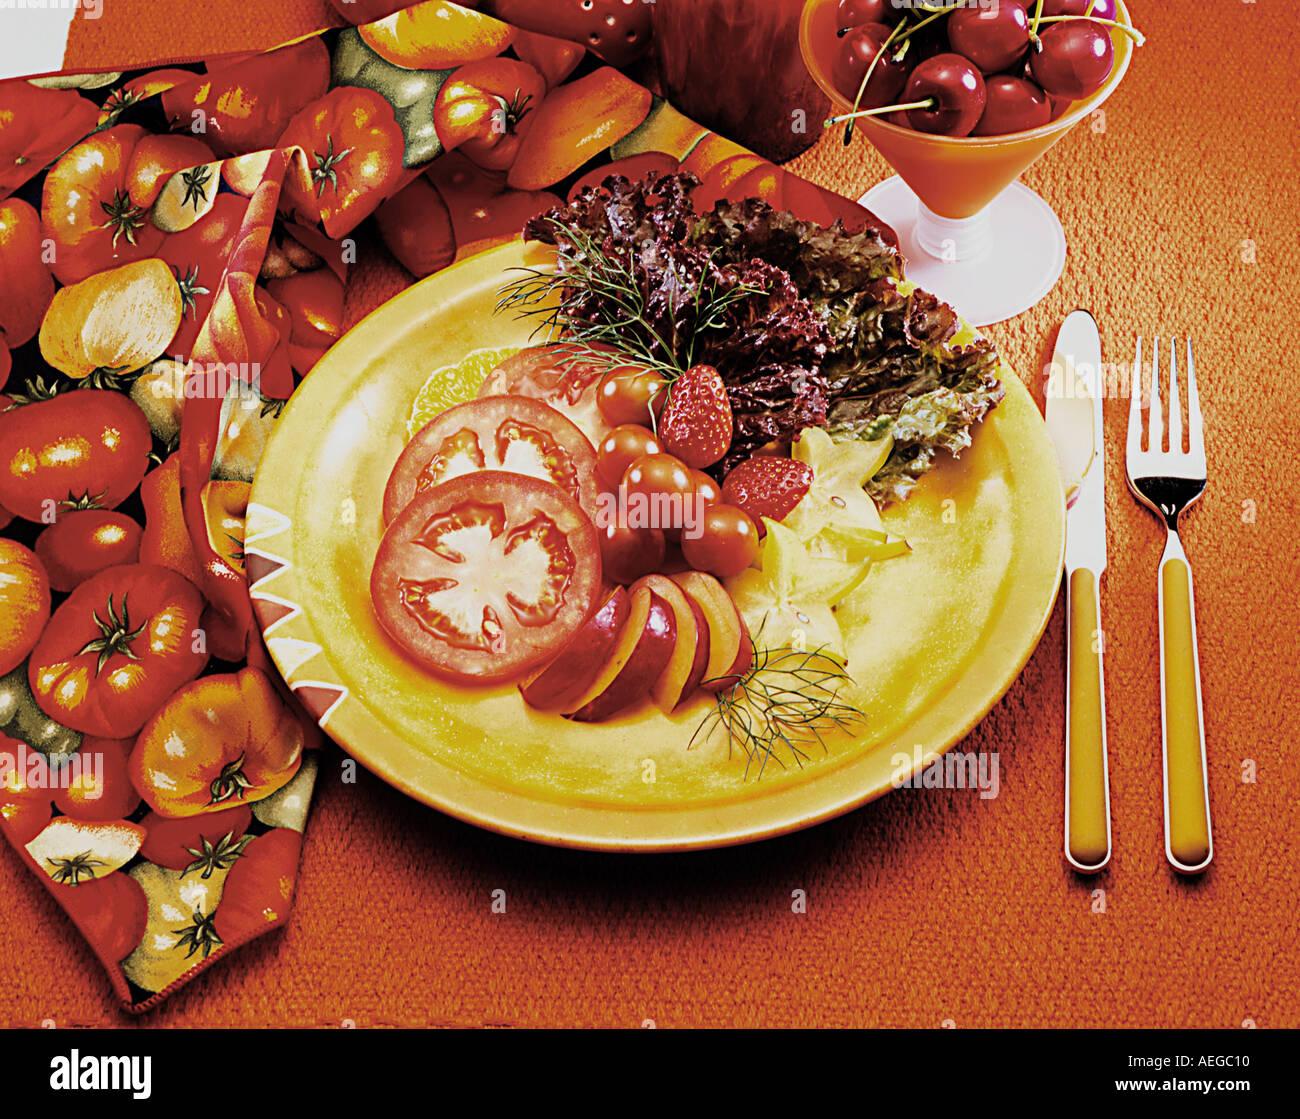 Food salad plate round dish silverware china fork knife setup table set napkin sliced tomato apple cup cherry cherries strawberr & Food salad plate round dish silverware china fork knife setup table ...